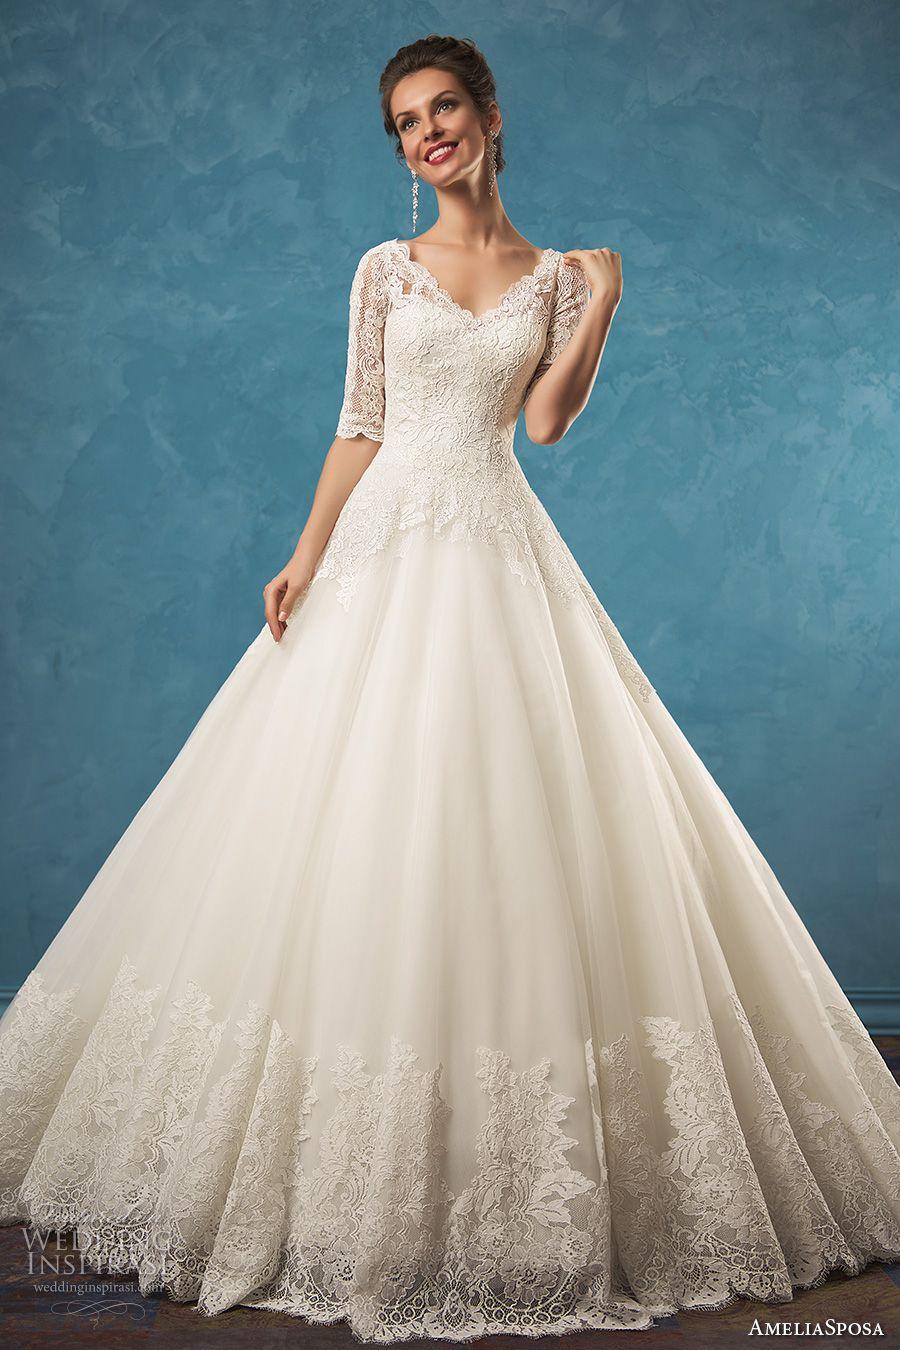 Amelia Sposa 2017 Wedding Dresses | Novios, Vestidos de novia y De novia